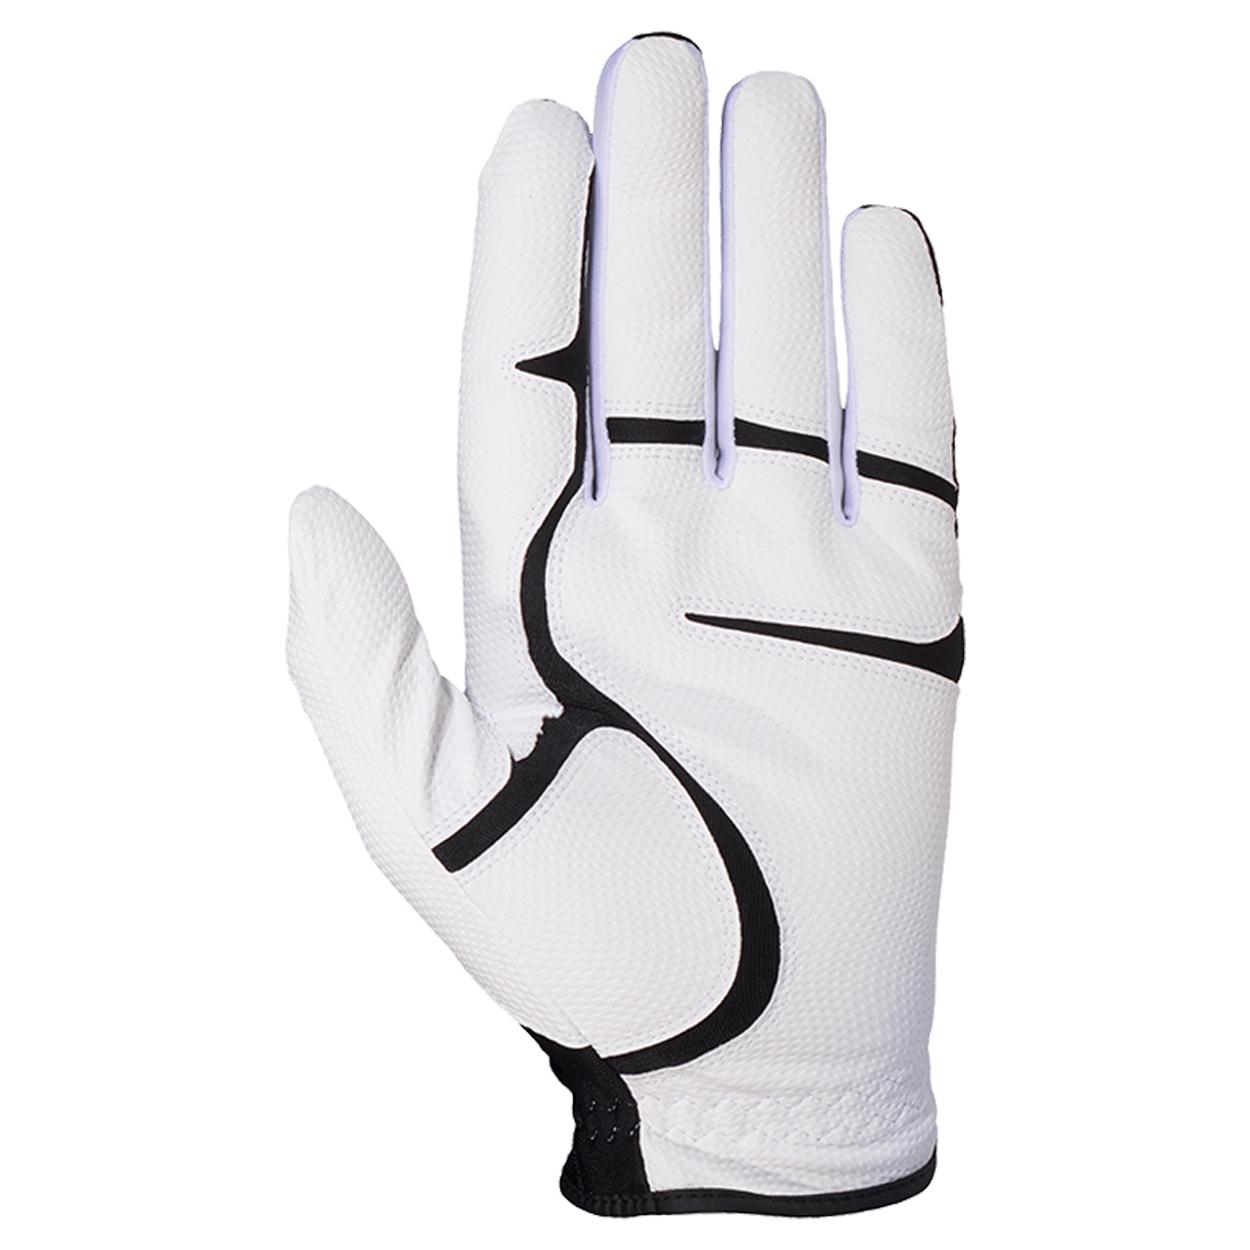 Bridgestone-Men-039-s-EZ-Fit-White-Golf-Gloves-3-Pack-NEW thumbnail 6